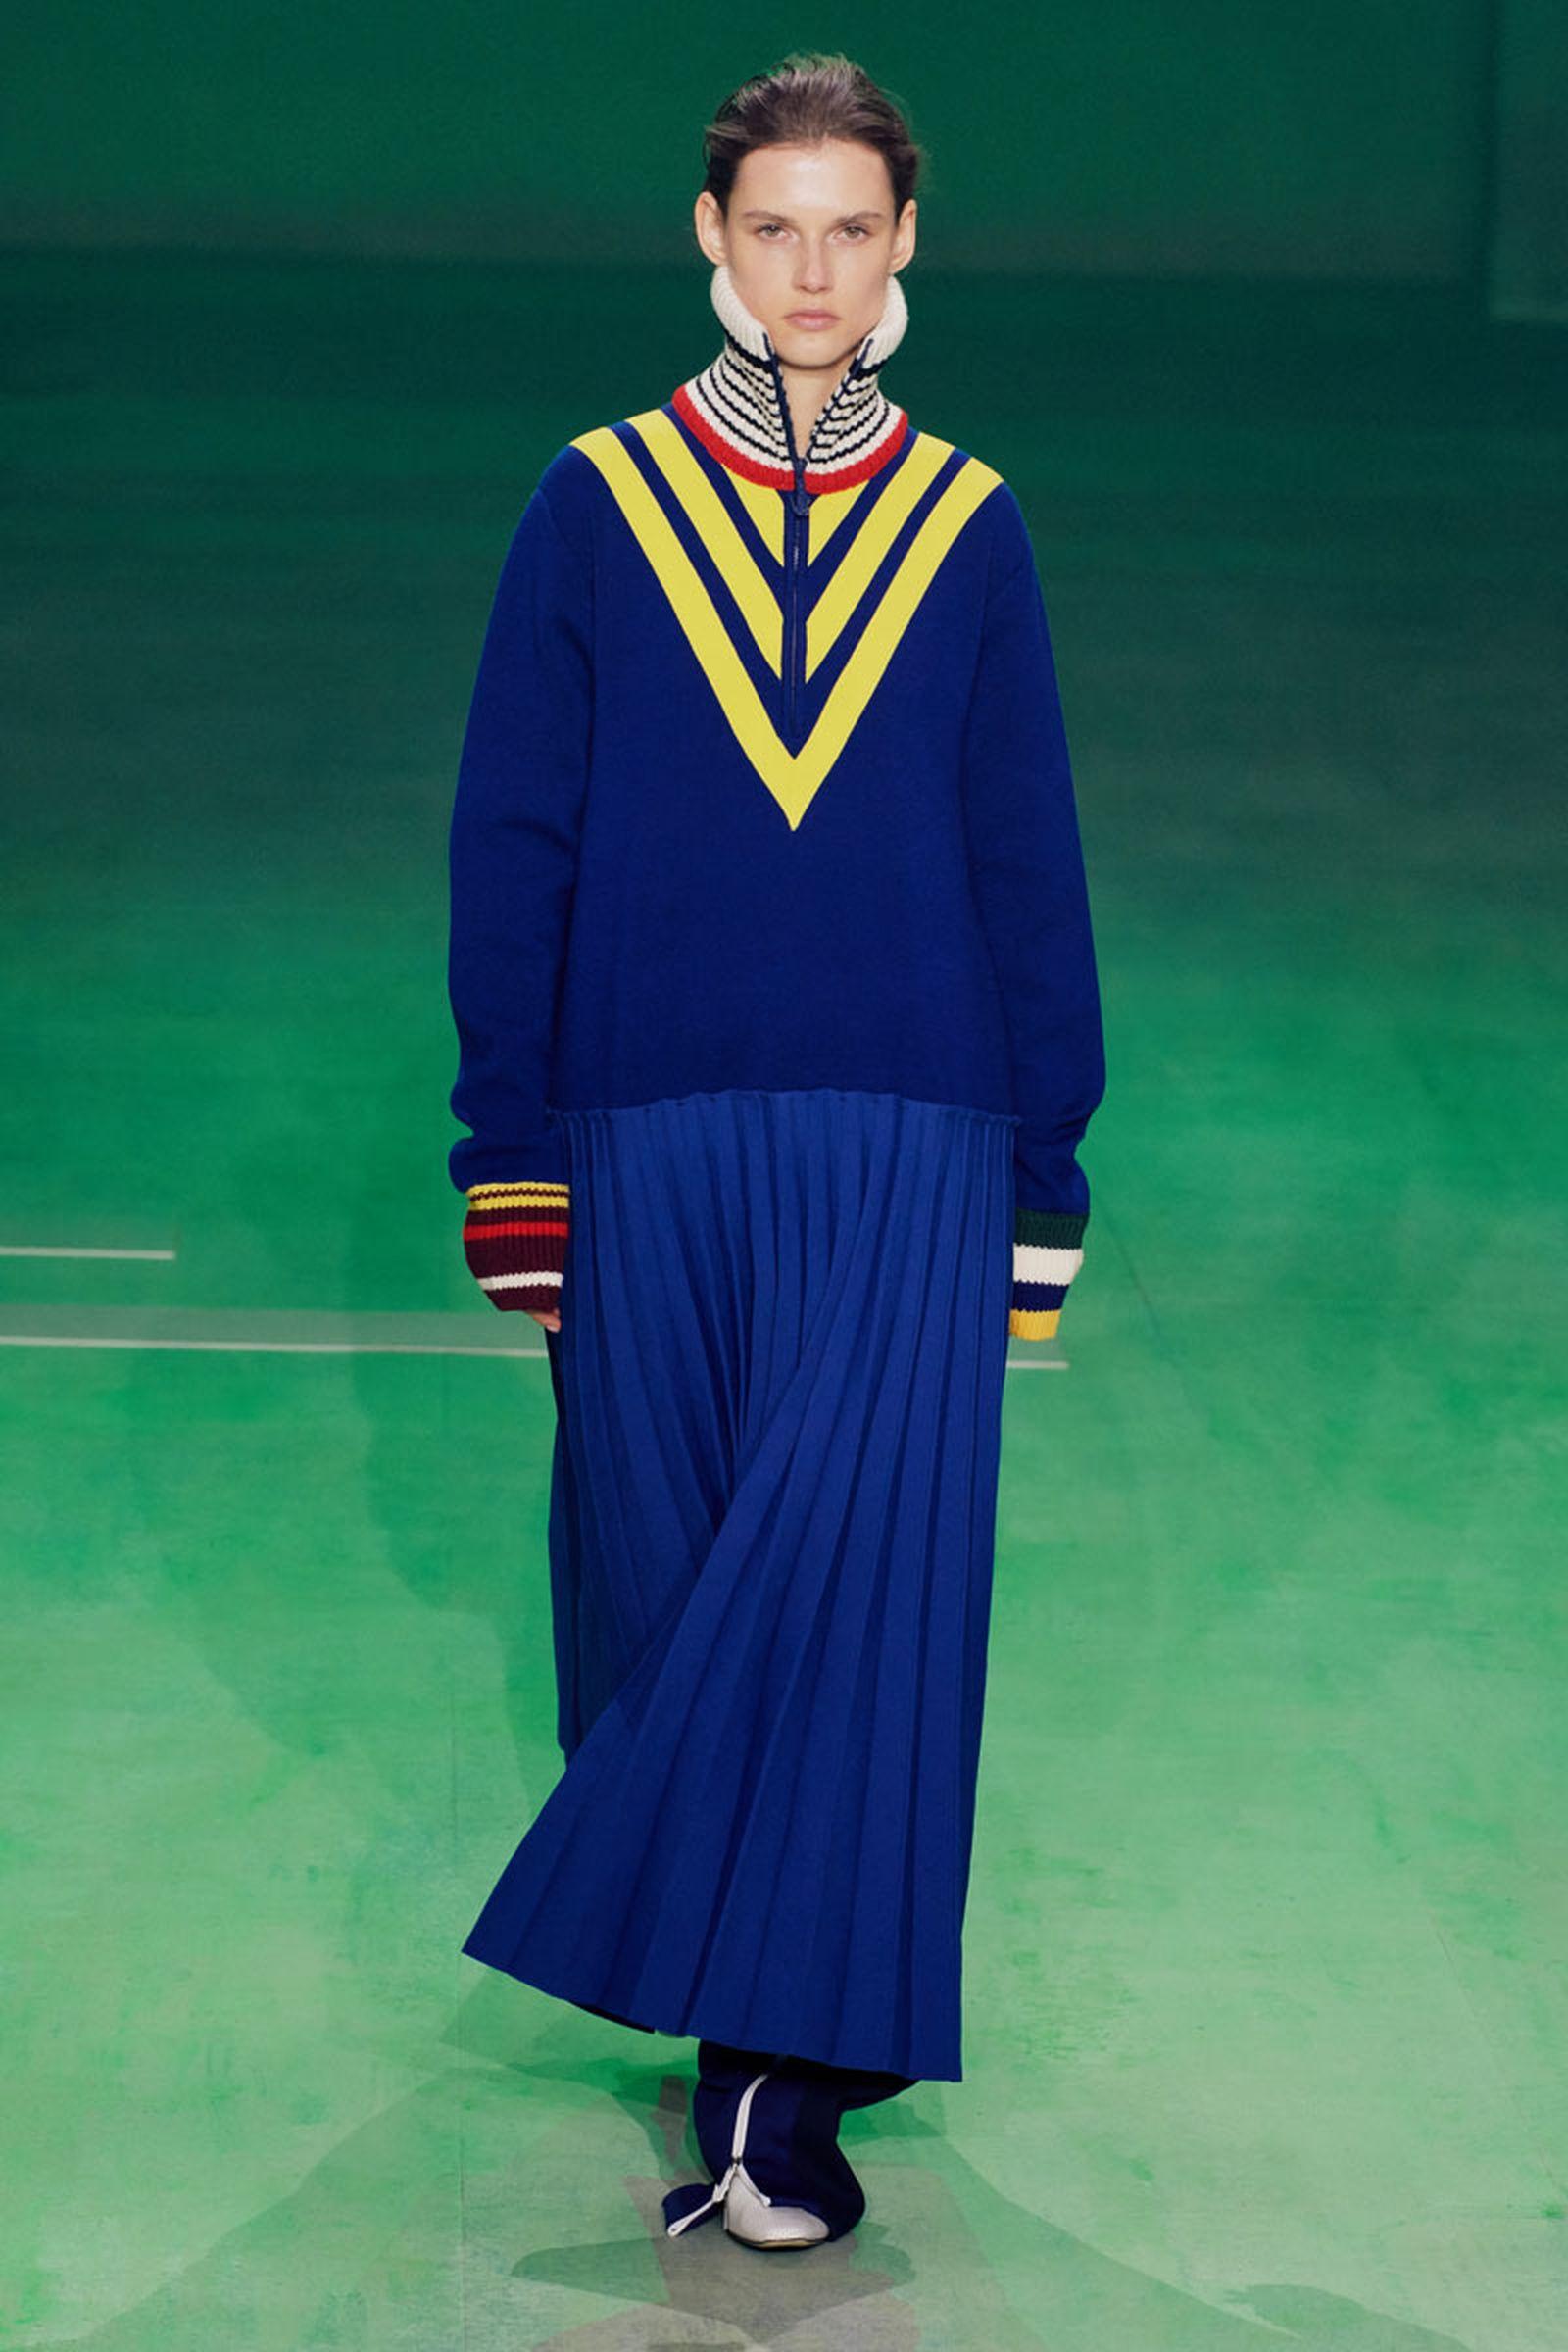 65lascoste fw19 paris fashion week Louise Trotter lacoste runway